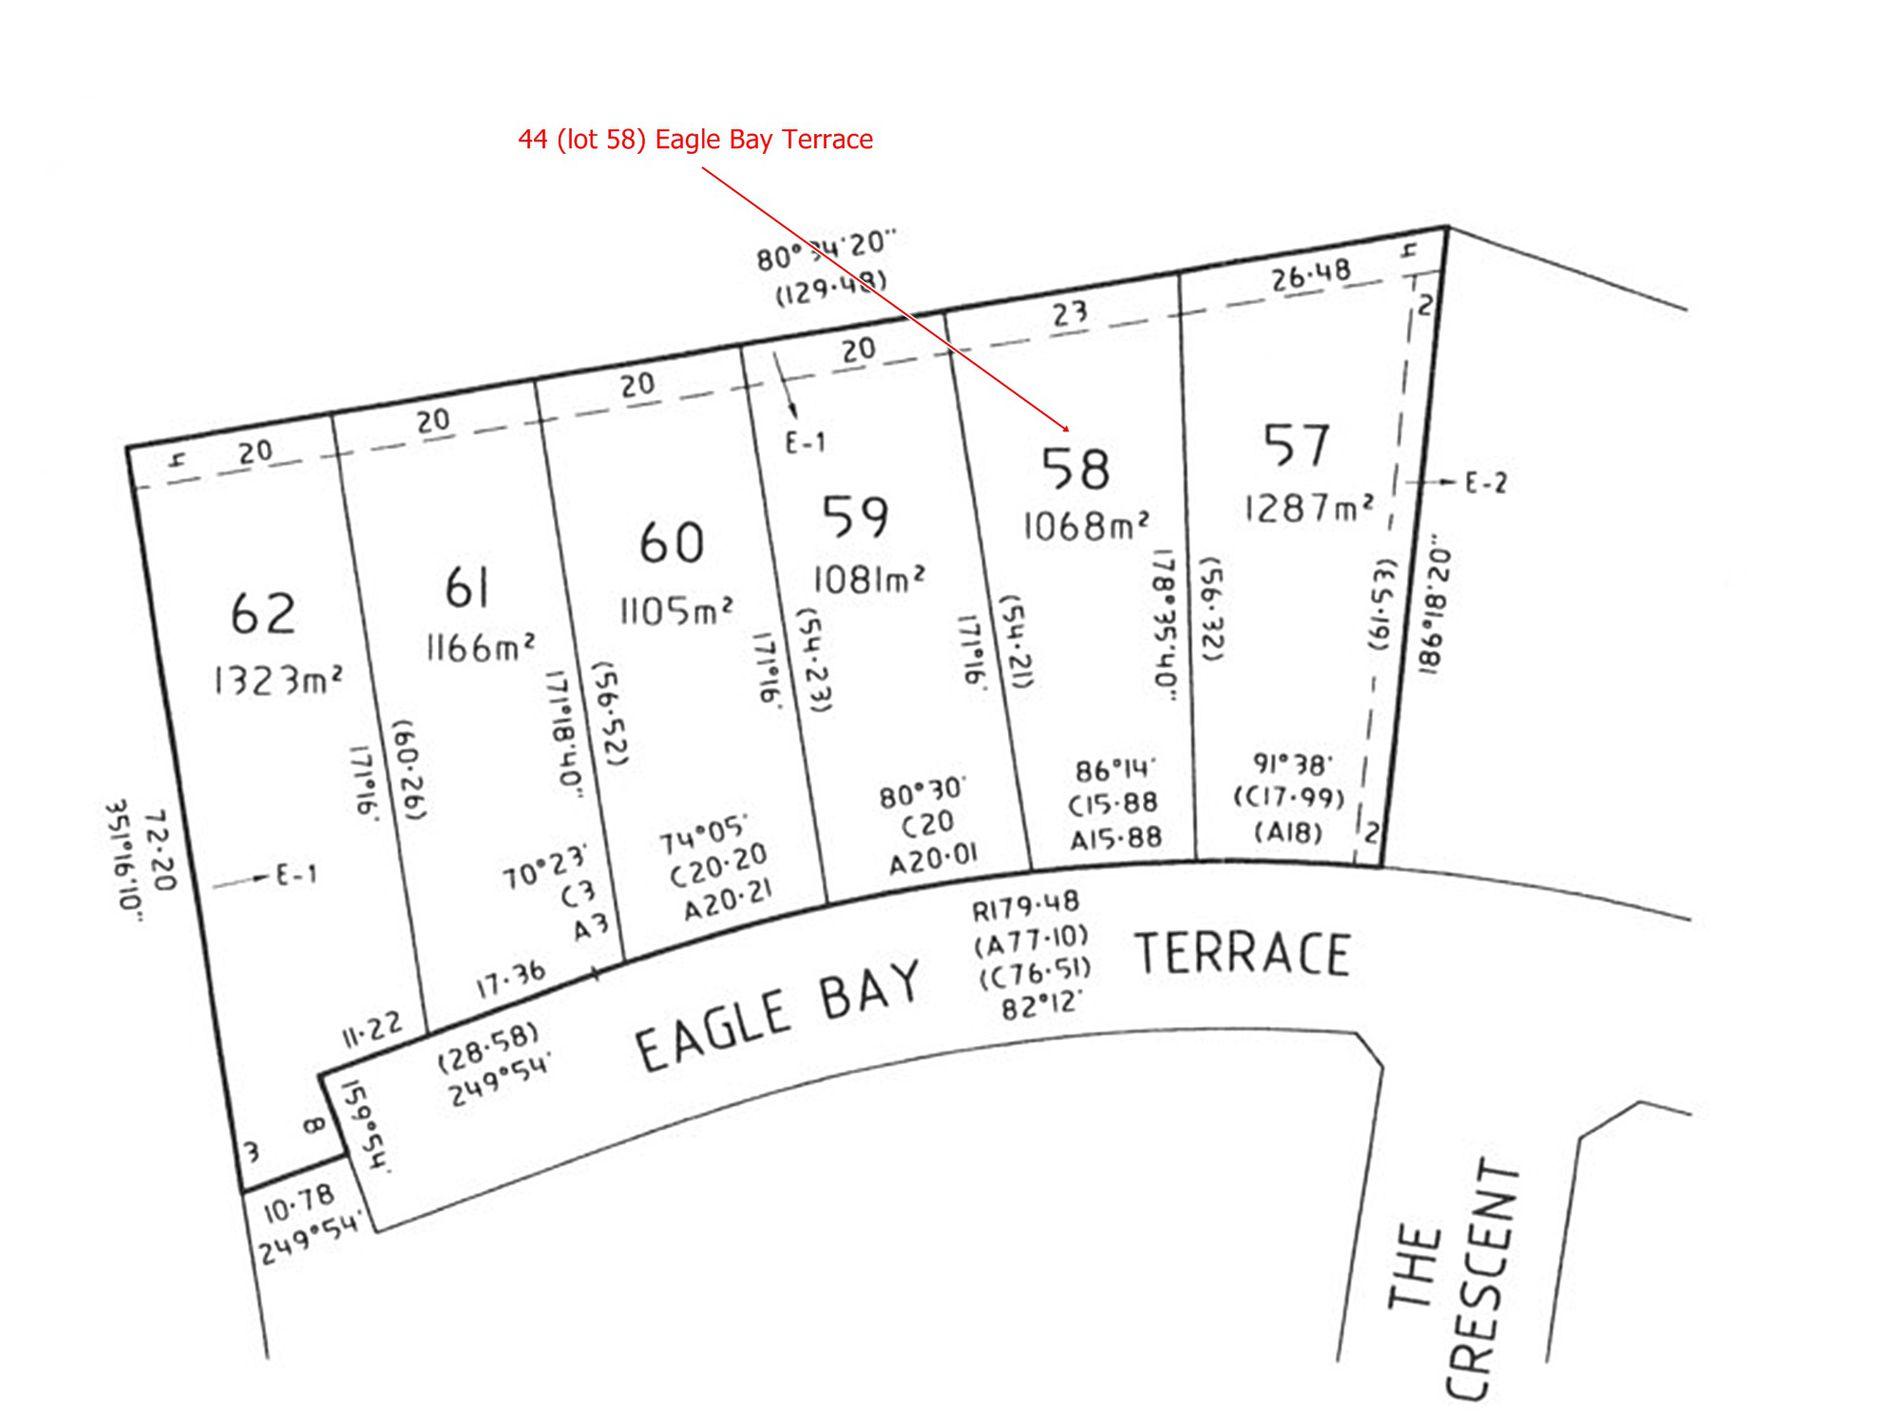 44 Eagle Bay Terrace, Eagle Point